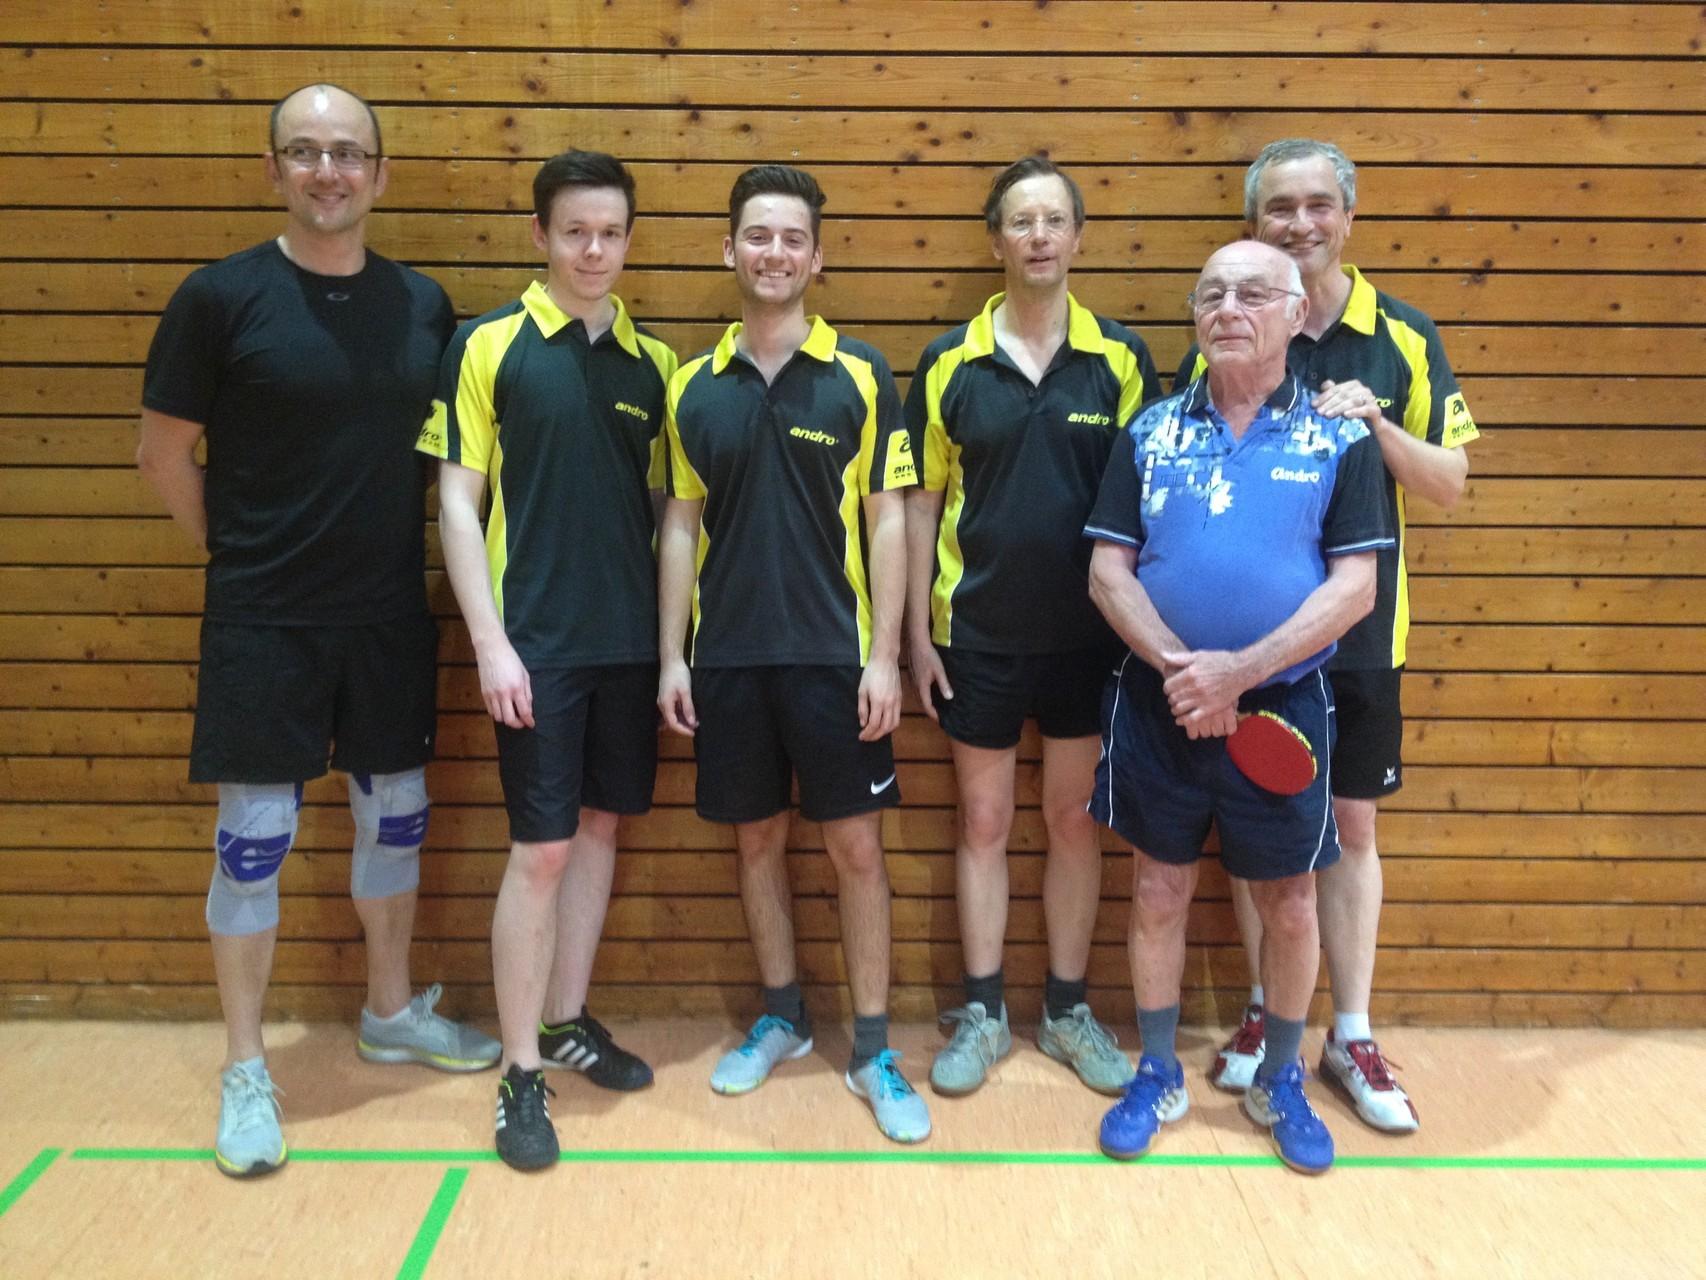 2. Herren 2015/16; Vassilli Pustovarov, Robin Stehle, Dominik Baitinger, Bernd Müller, Willi Neubig, Klaus Grieb